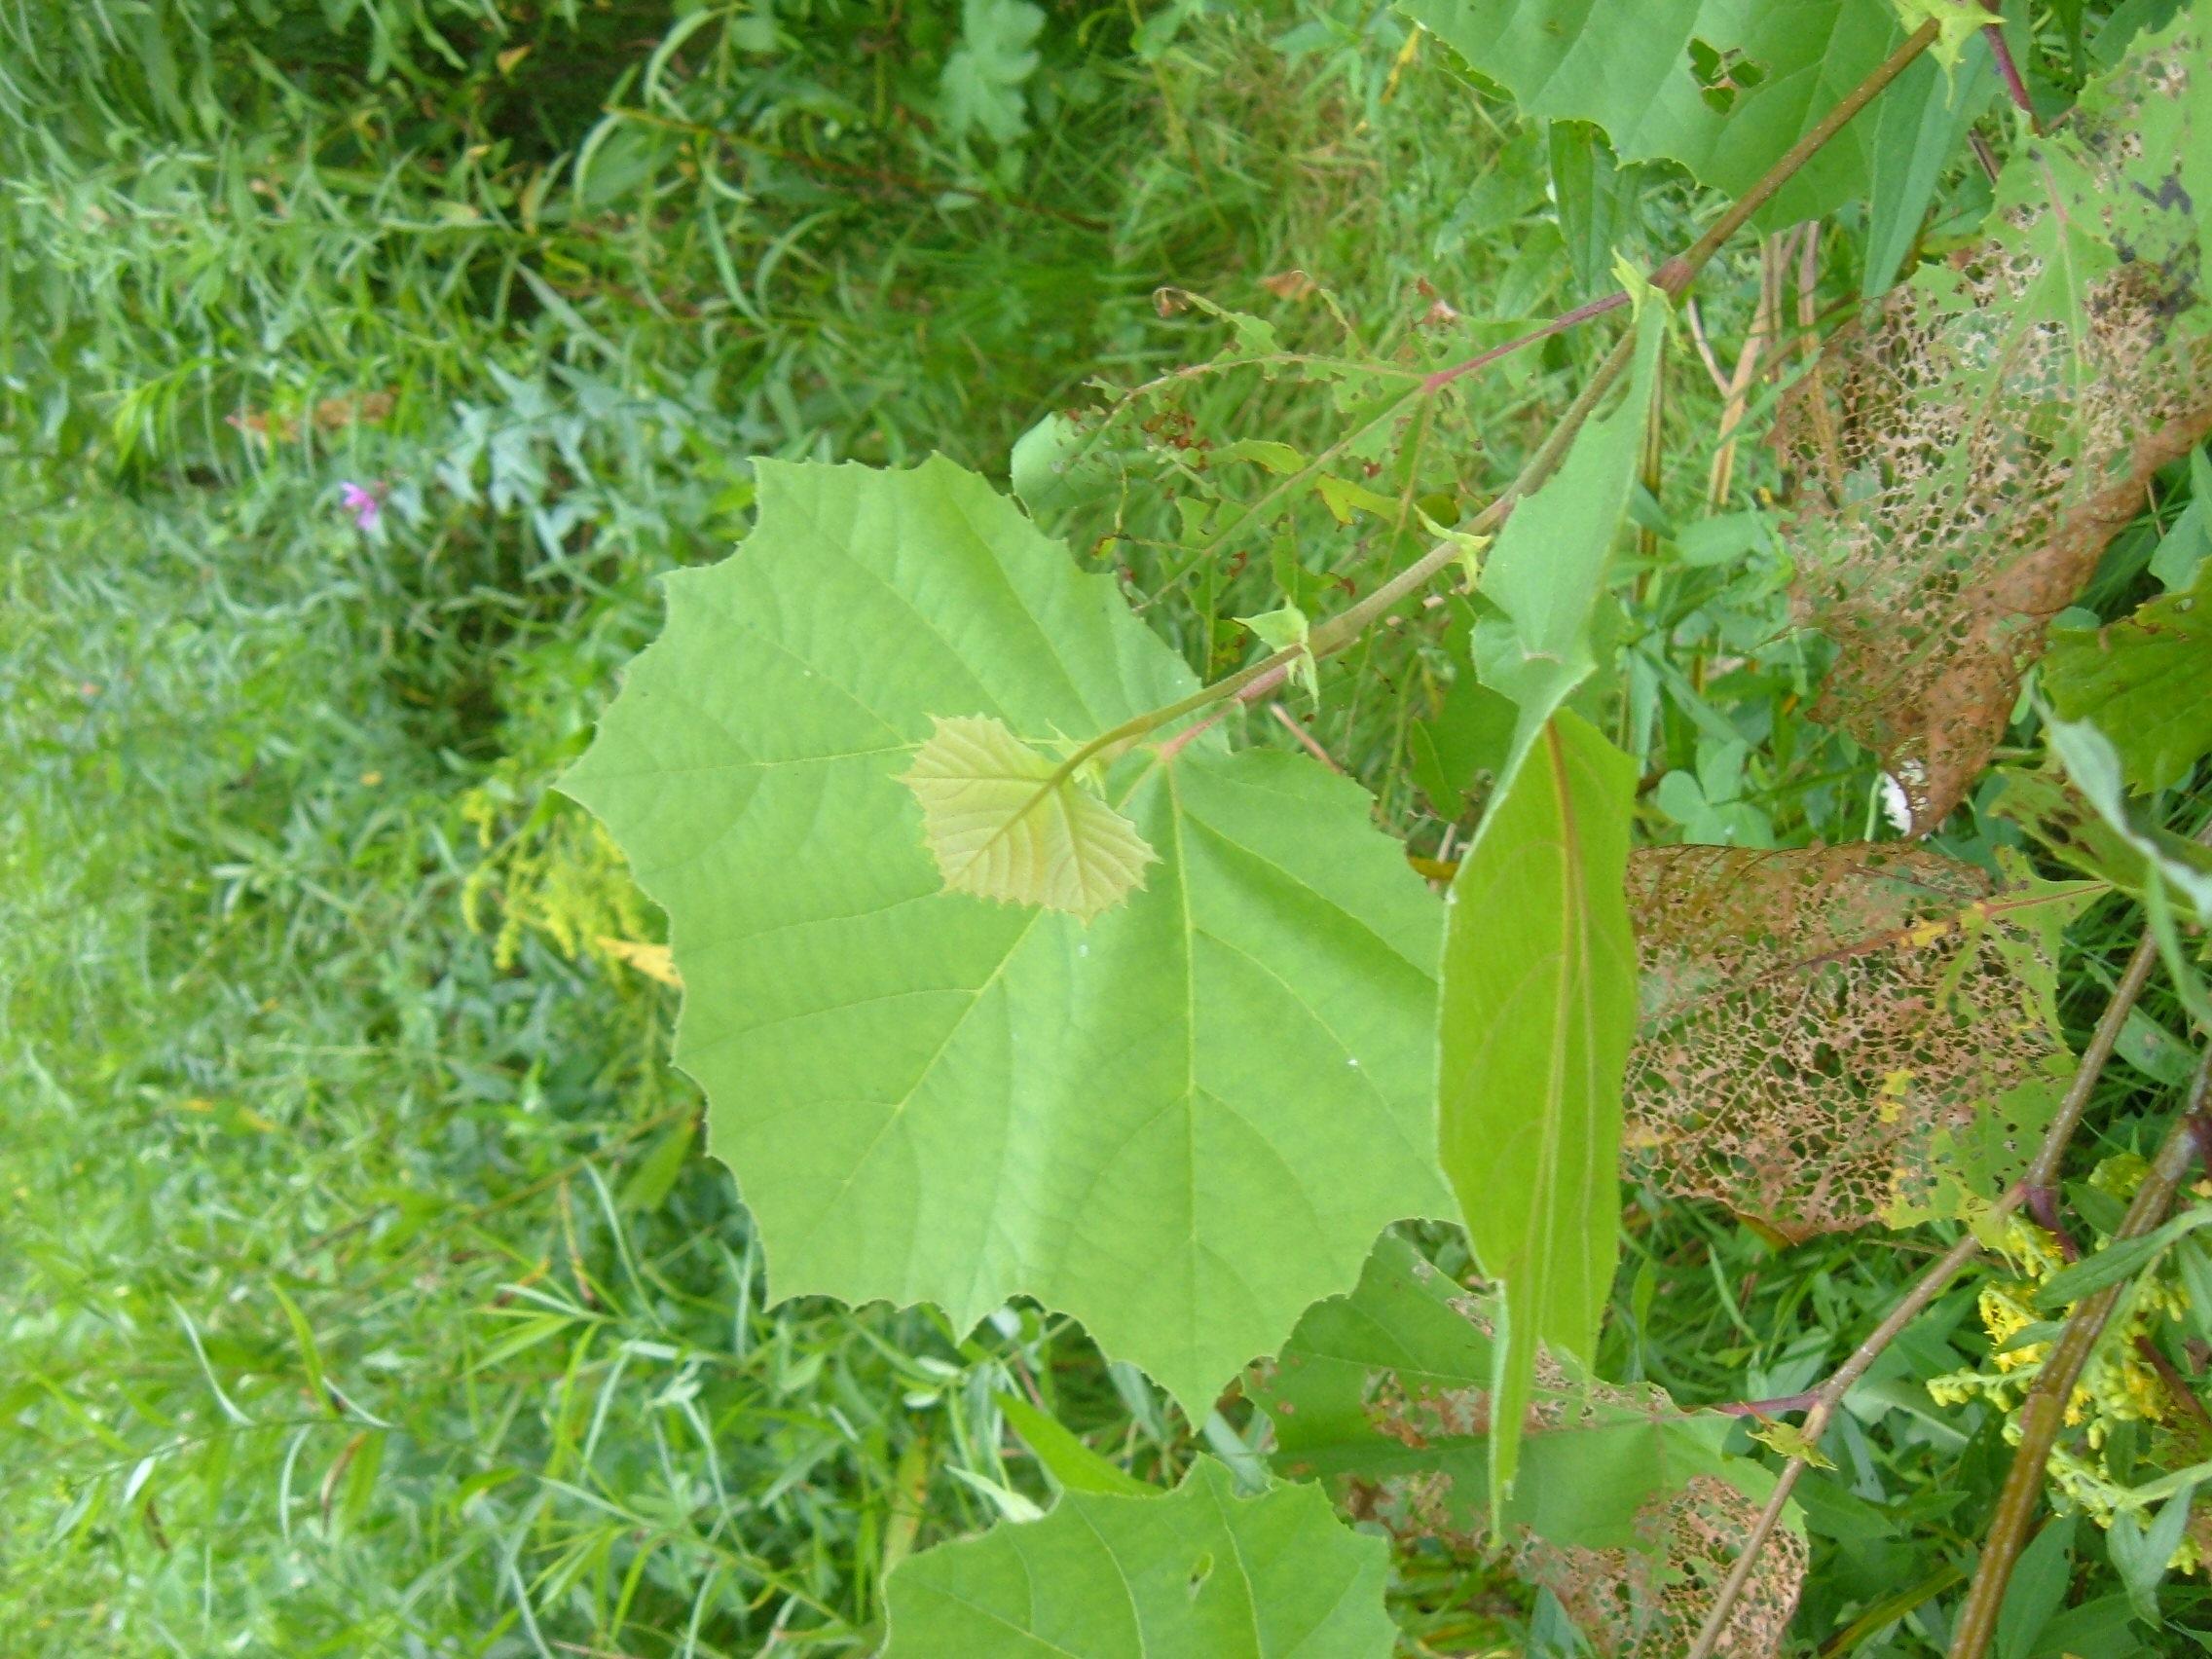 occidentalis leaf displaying 19 images for platanus occidentalis leafPlatanus Occidentalis Leaf